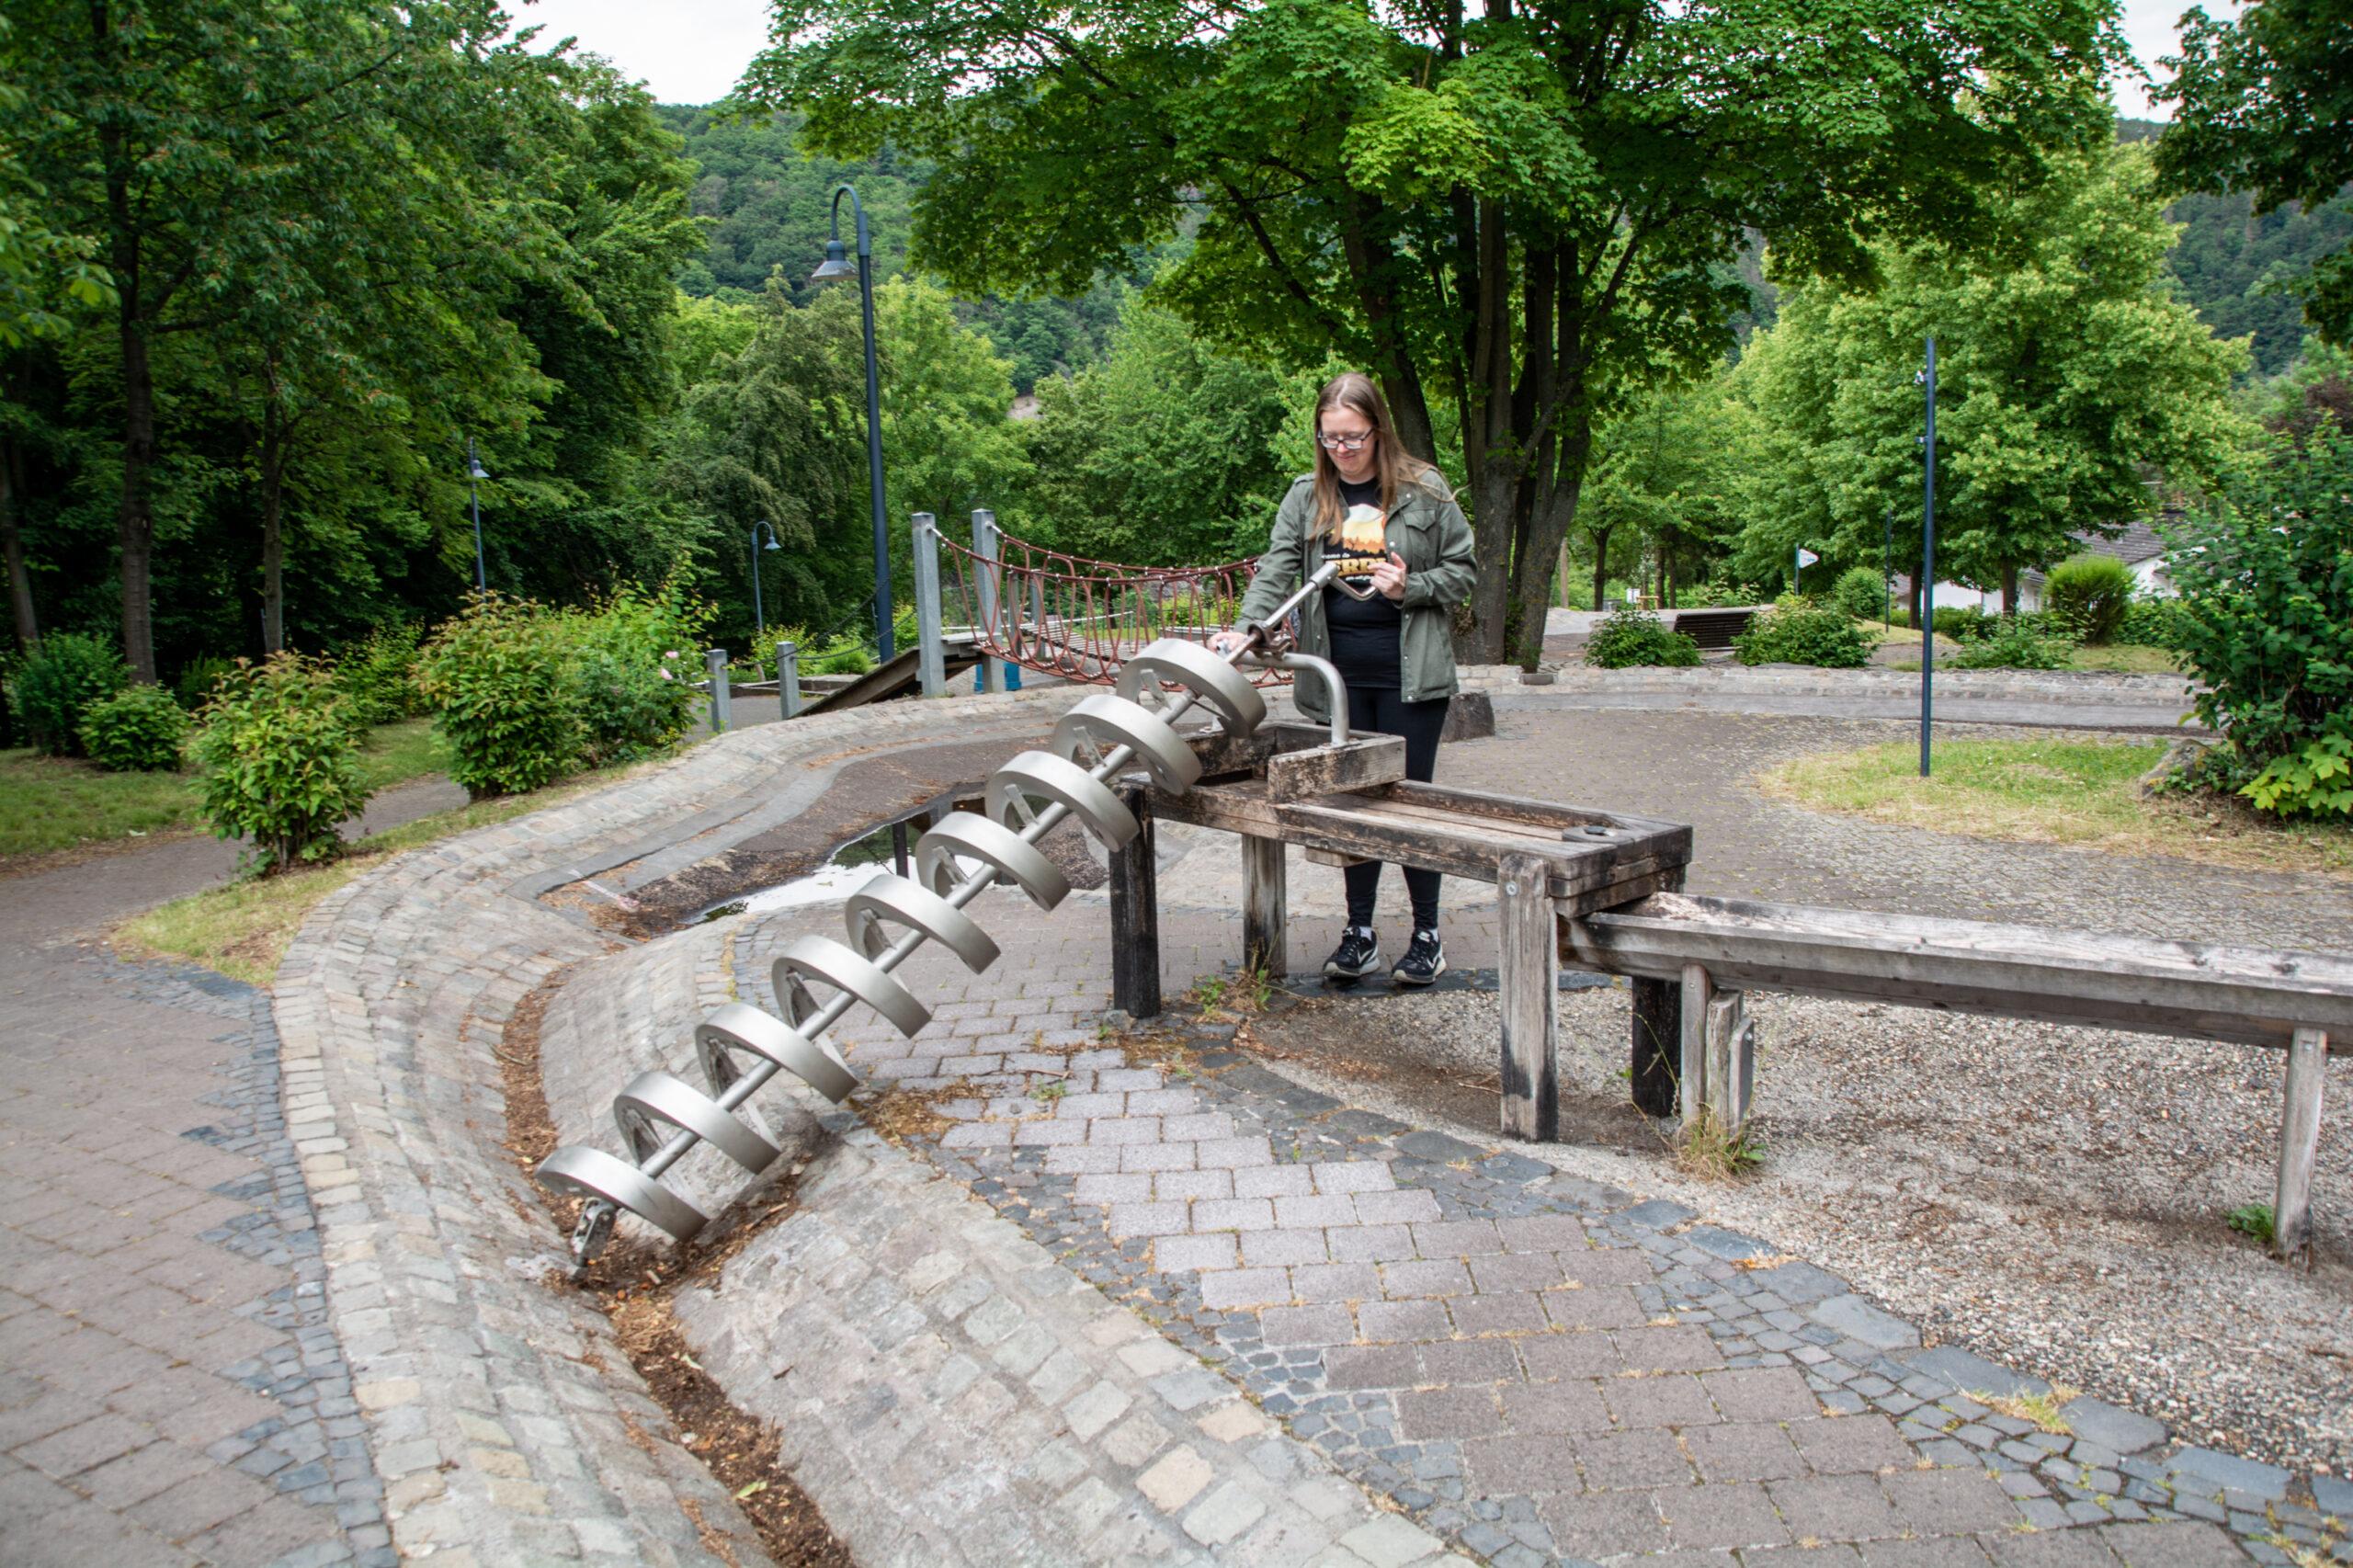 Edertalsperre | Edersee | Hessen